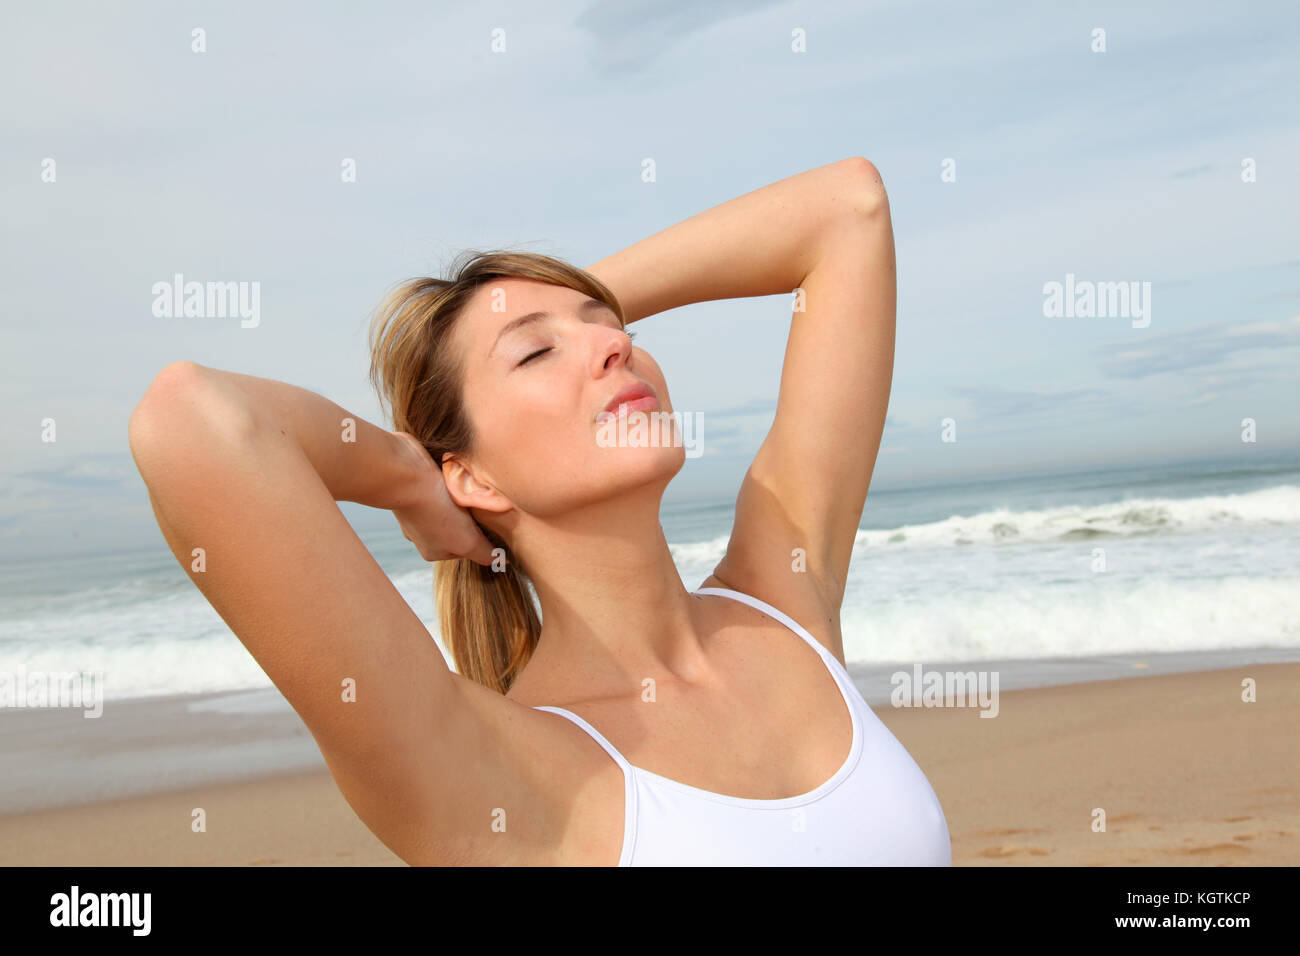 Beautiful woman breathing fresh air at the beach - Stock Image